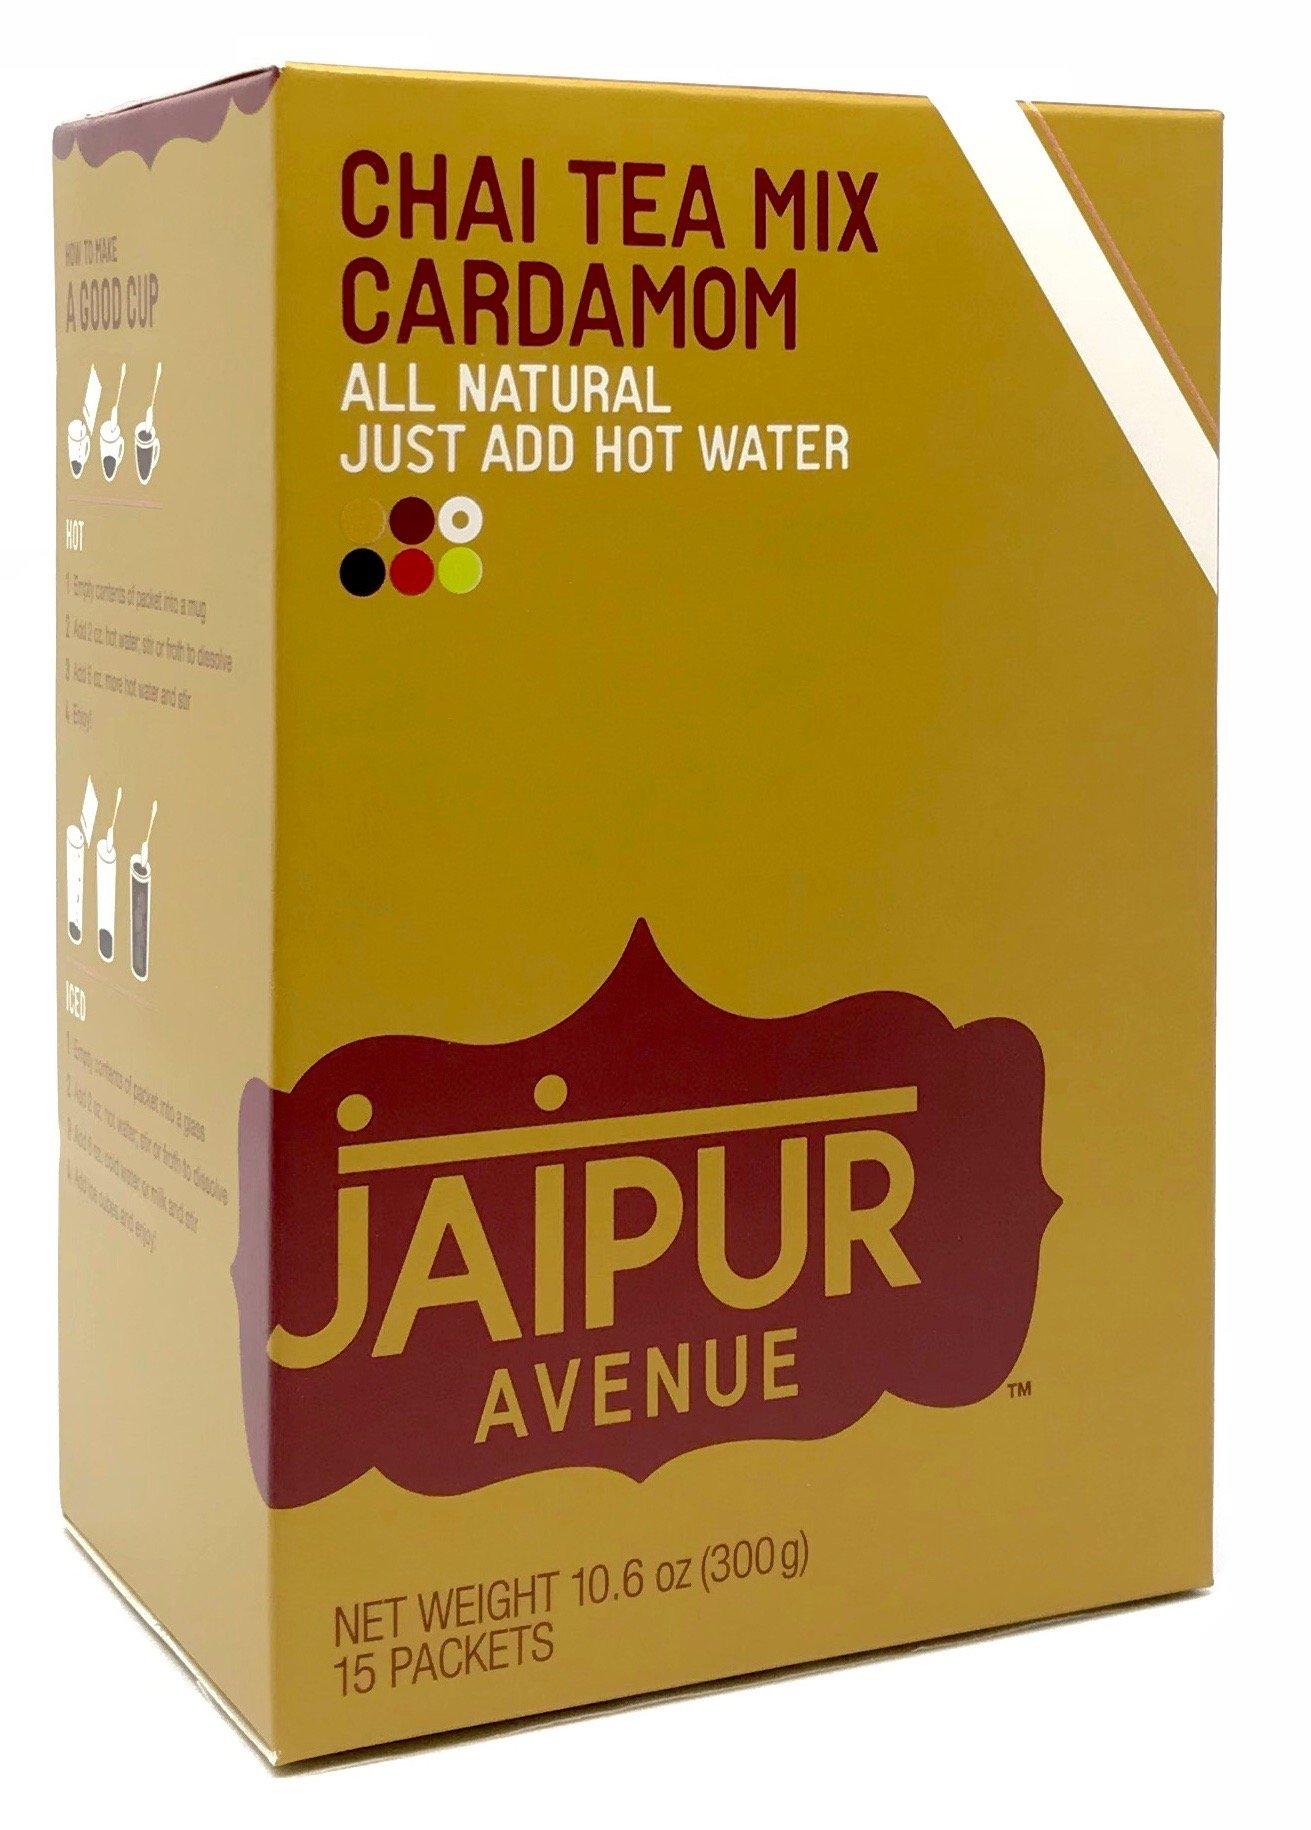 Jaipur Avenue Chai Tea Mix Cardamom (15-Count Box)